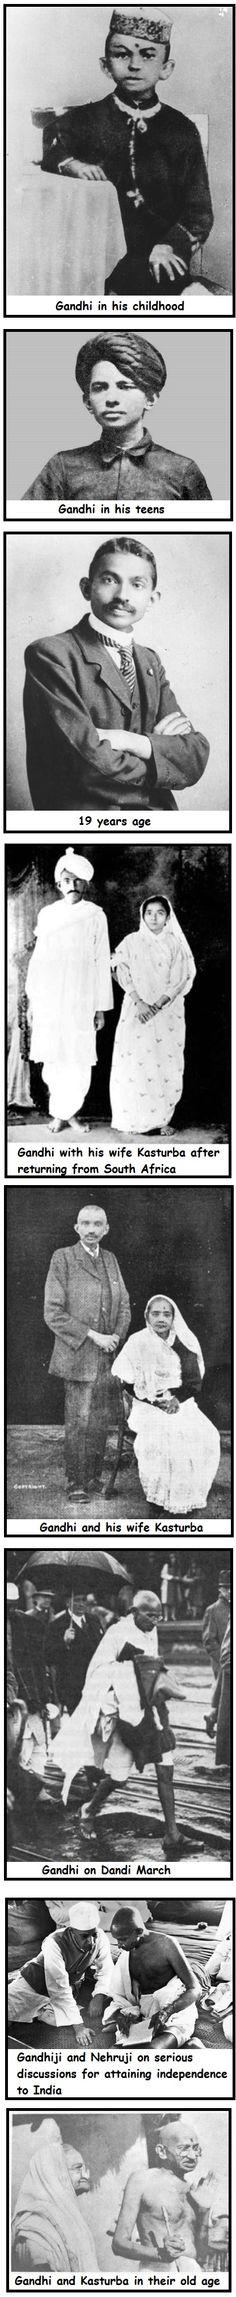 Mahatma Gandhi Photos - Child to Senior